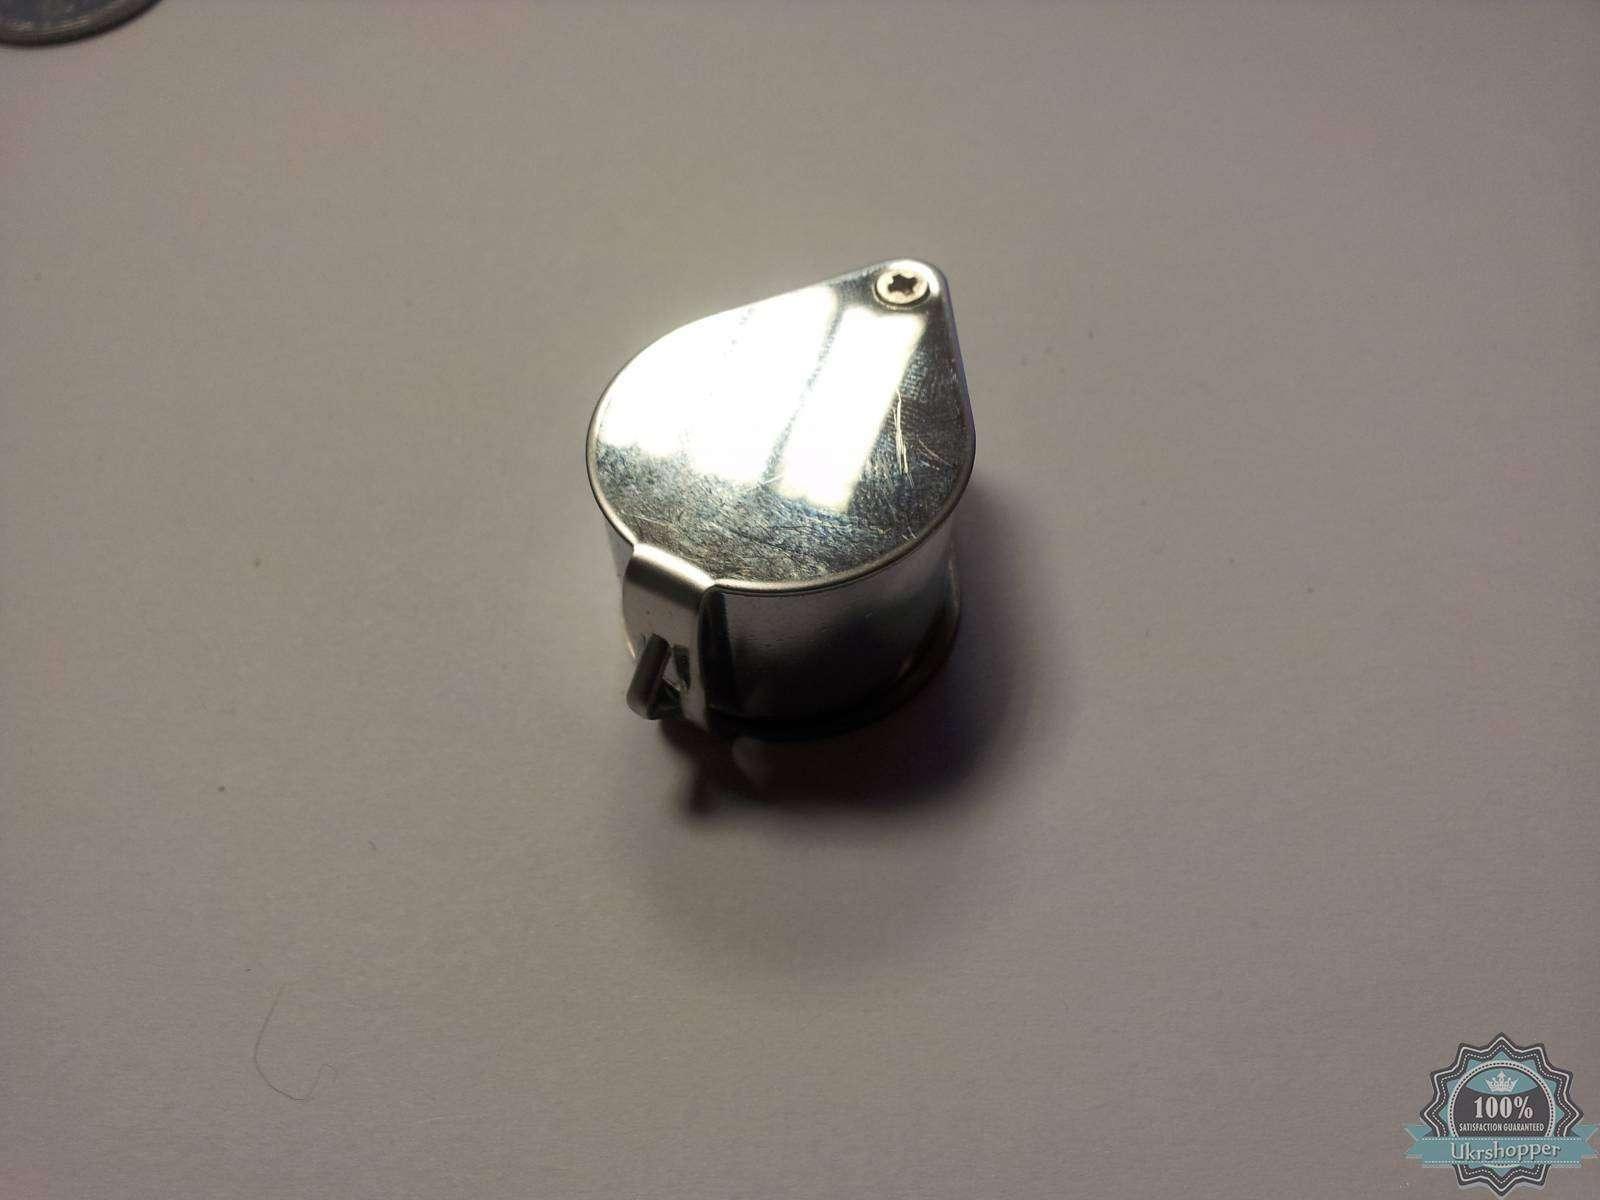 Aliexpress: 30ти кратная складная ювелирная  мини лупа